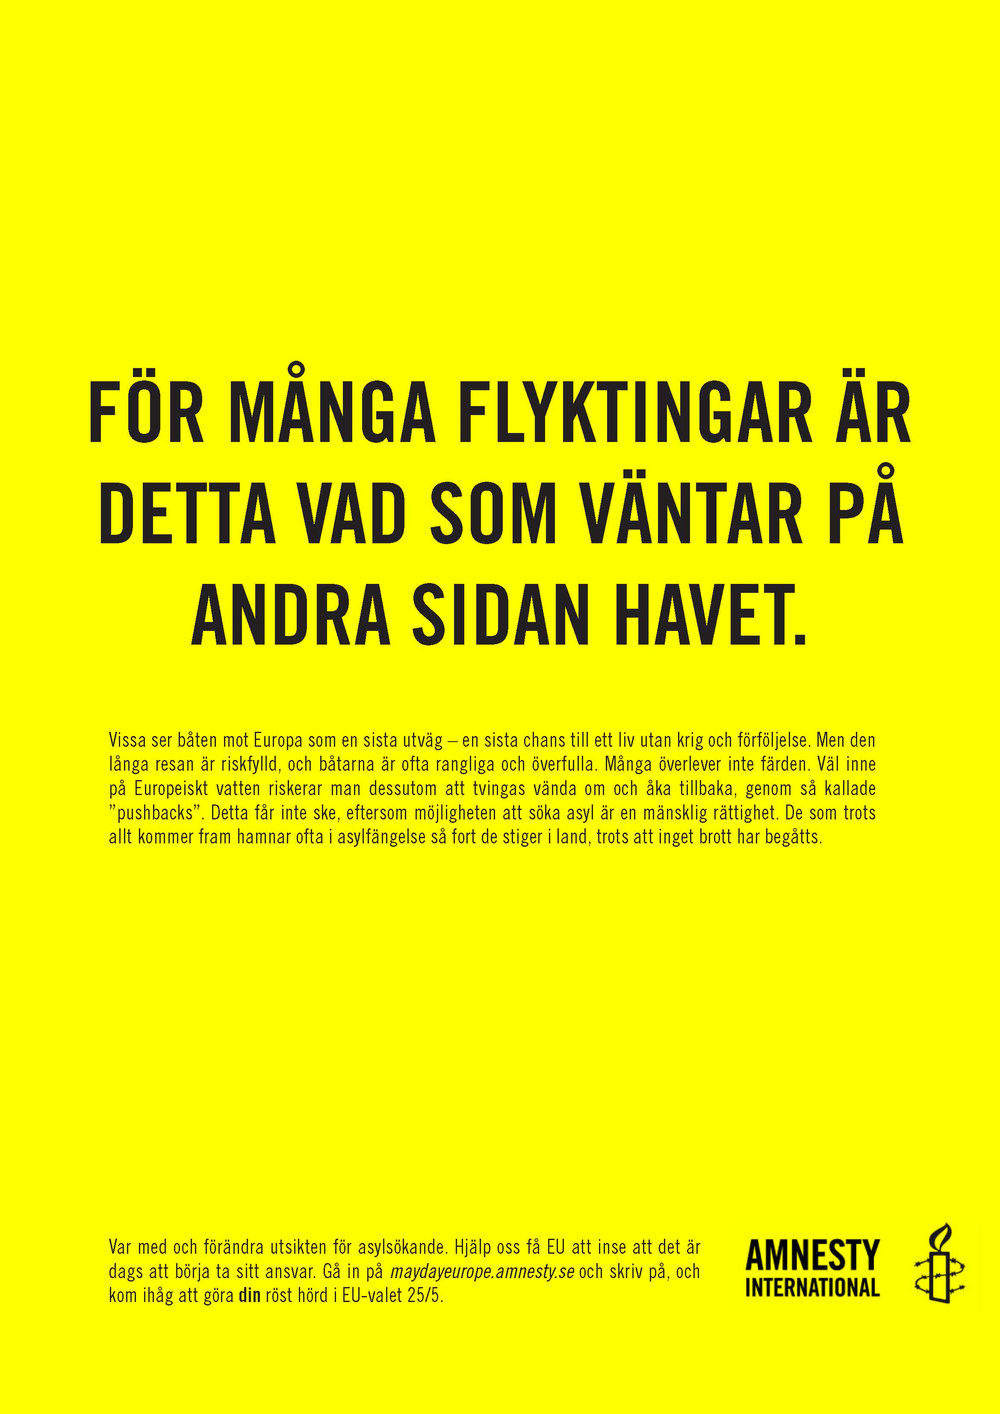 AmnestySverige_Annons1.1.jpg